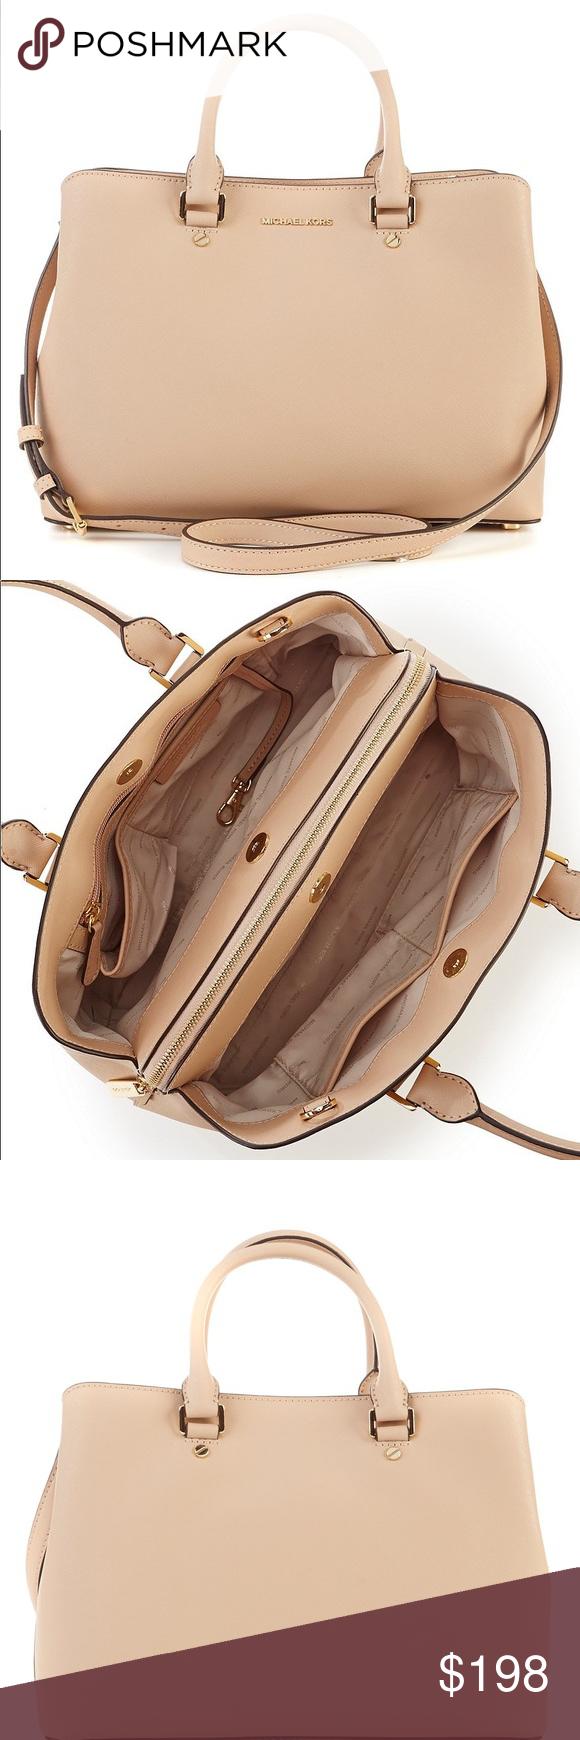 6541fdcfa2712d MICHAEL KORS SAVANNAH LARGE SATCHEL OYSTER MICHAEL Michael Kors, the Savannah  satchel features: saffiano